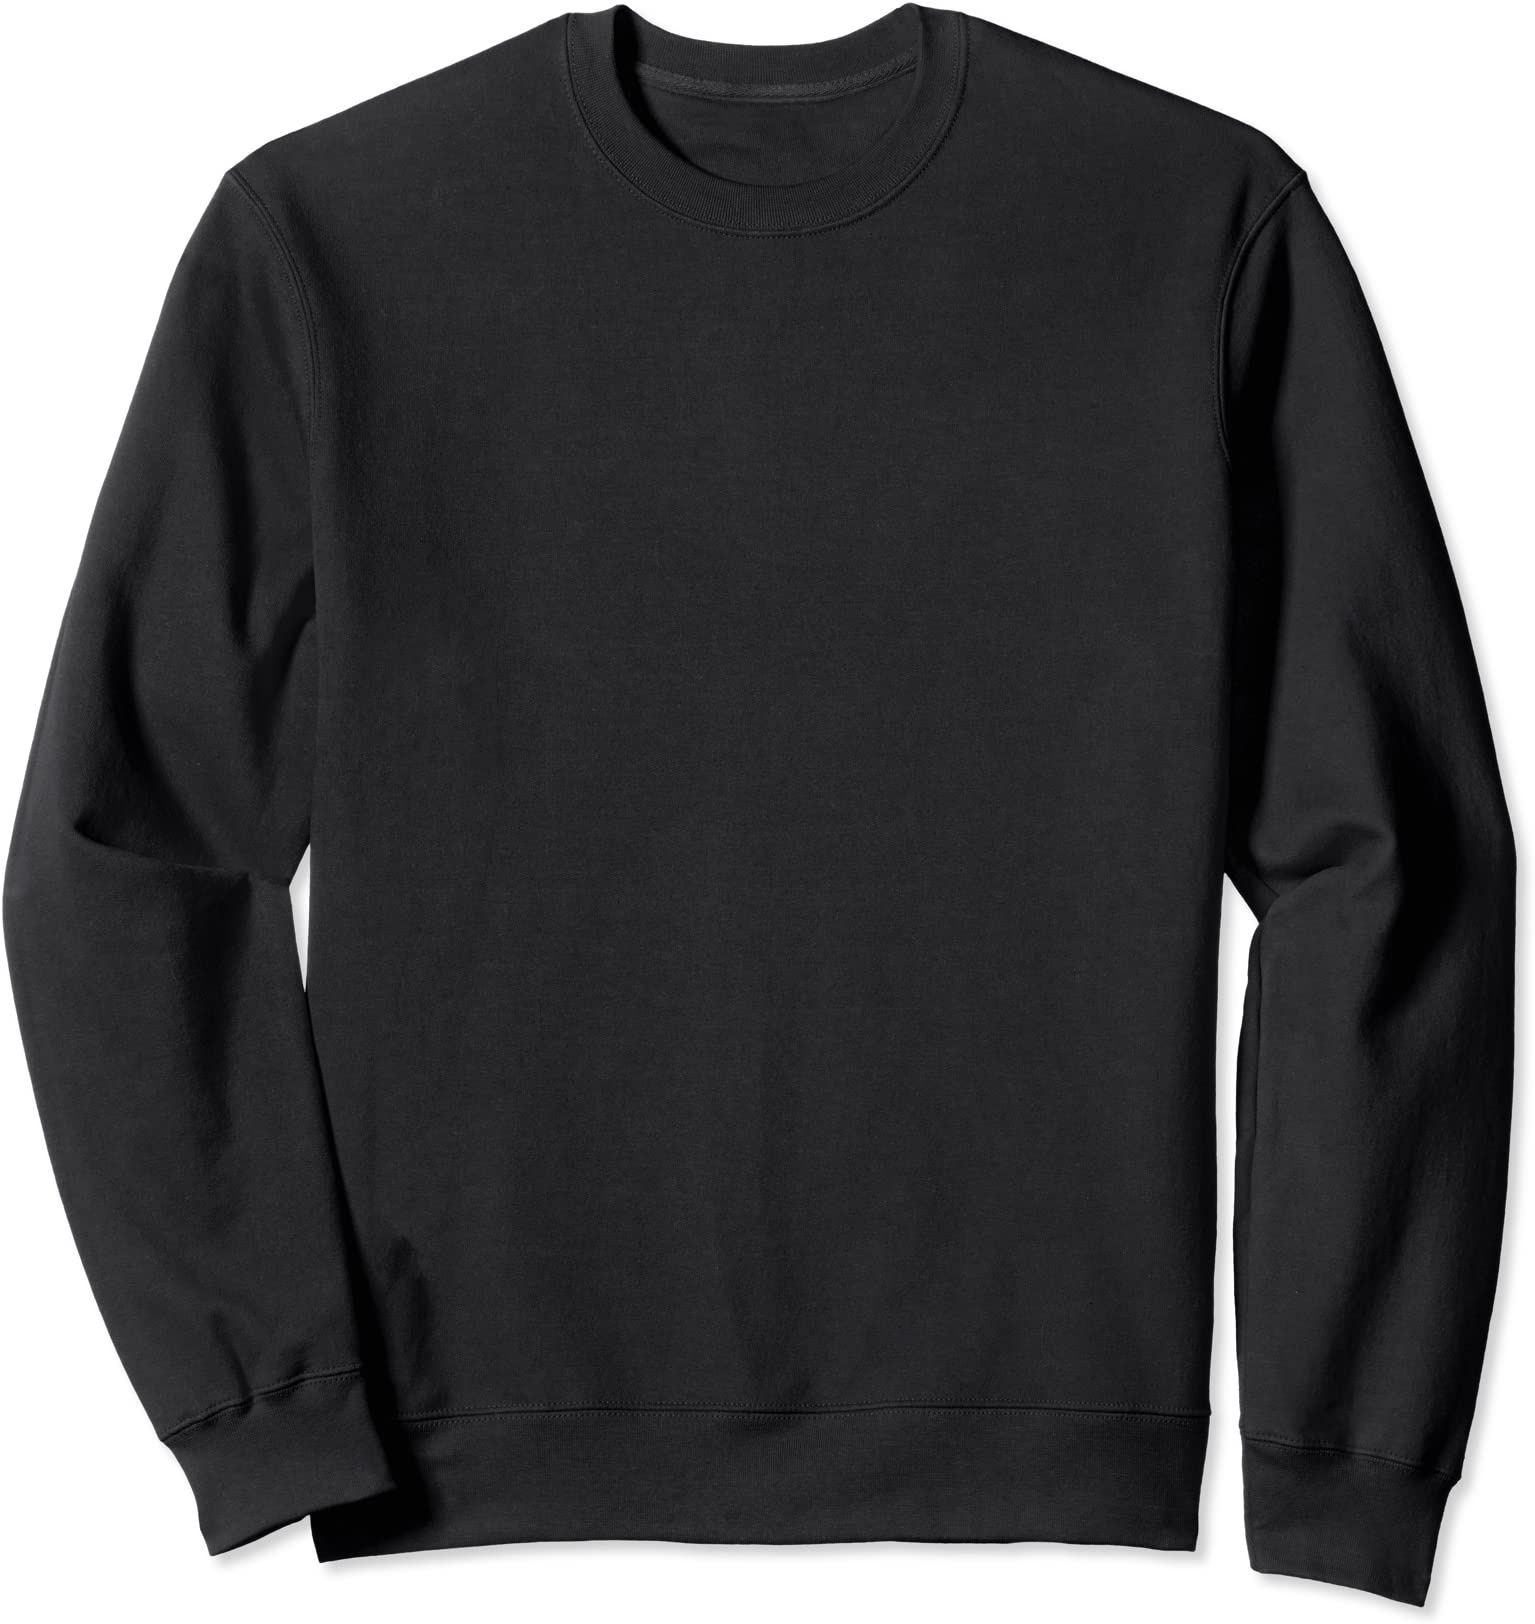 Christmas 3D Unisex Pullover President Trump Sweater Winter Pullover Coat Xmas